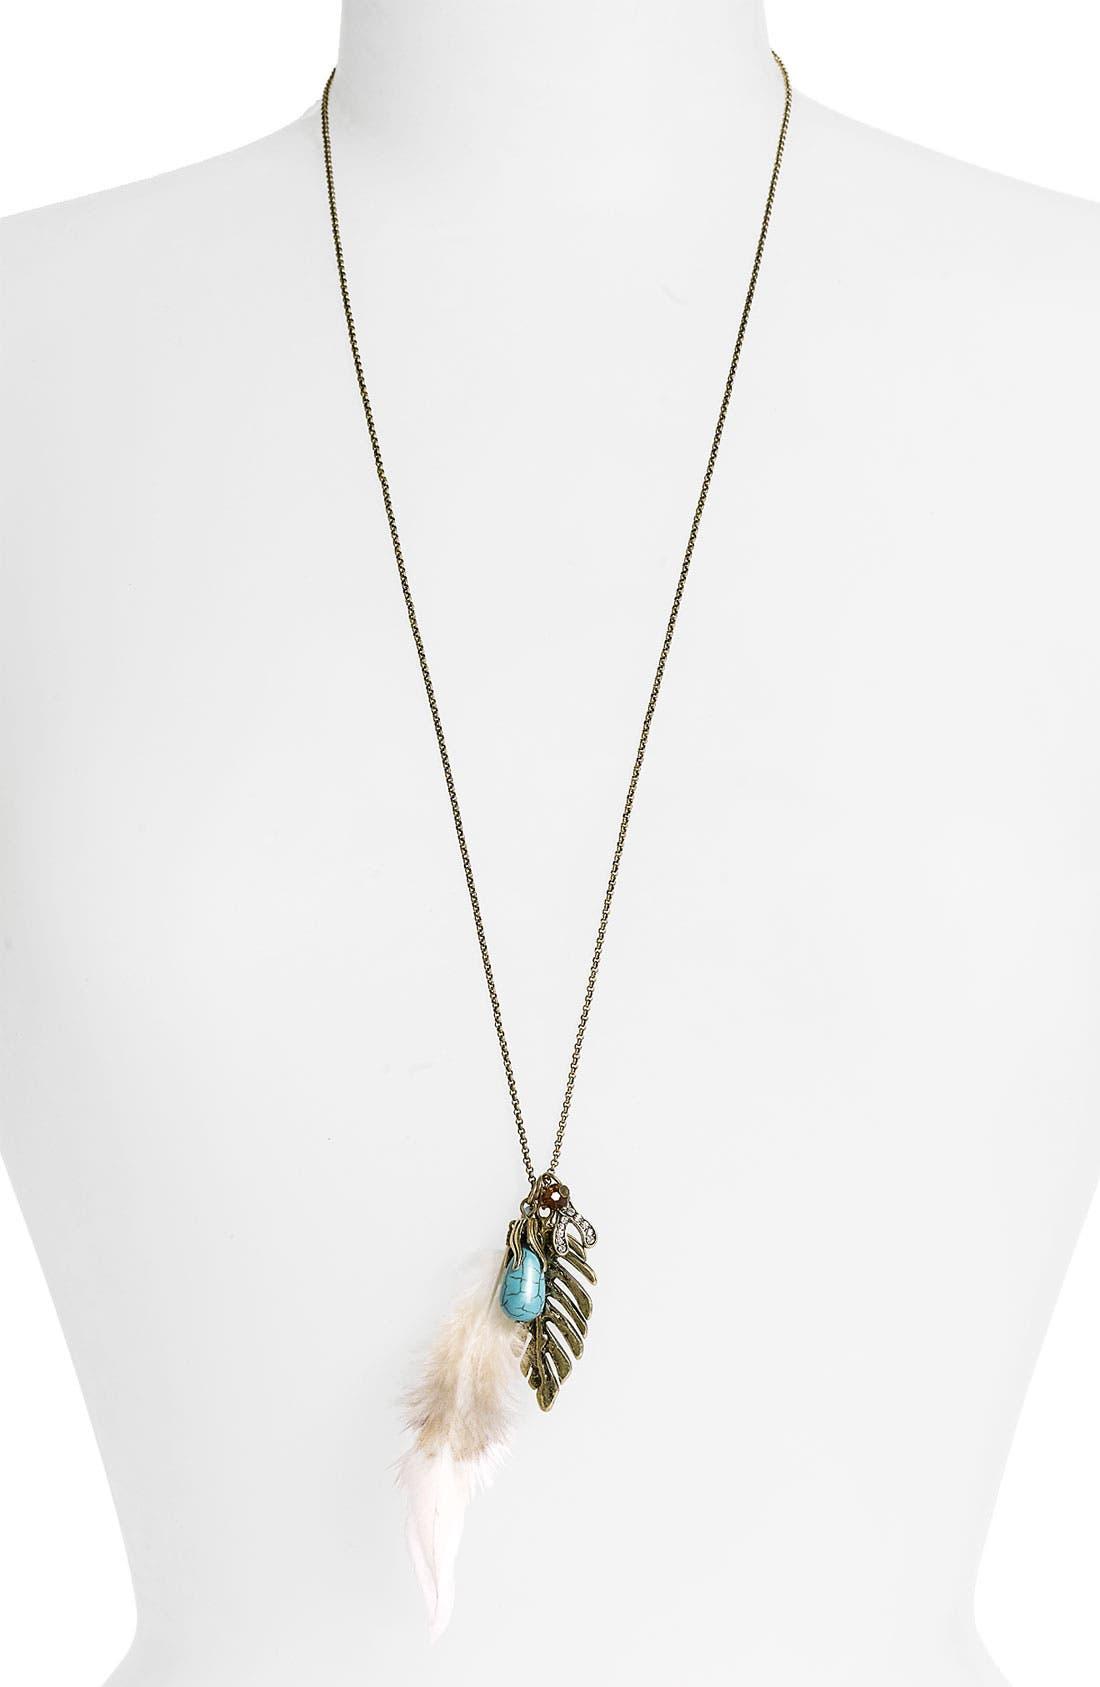 Alternate Image 1 Selected - Carole Leaf Charm Necklace